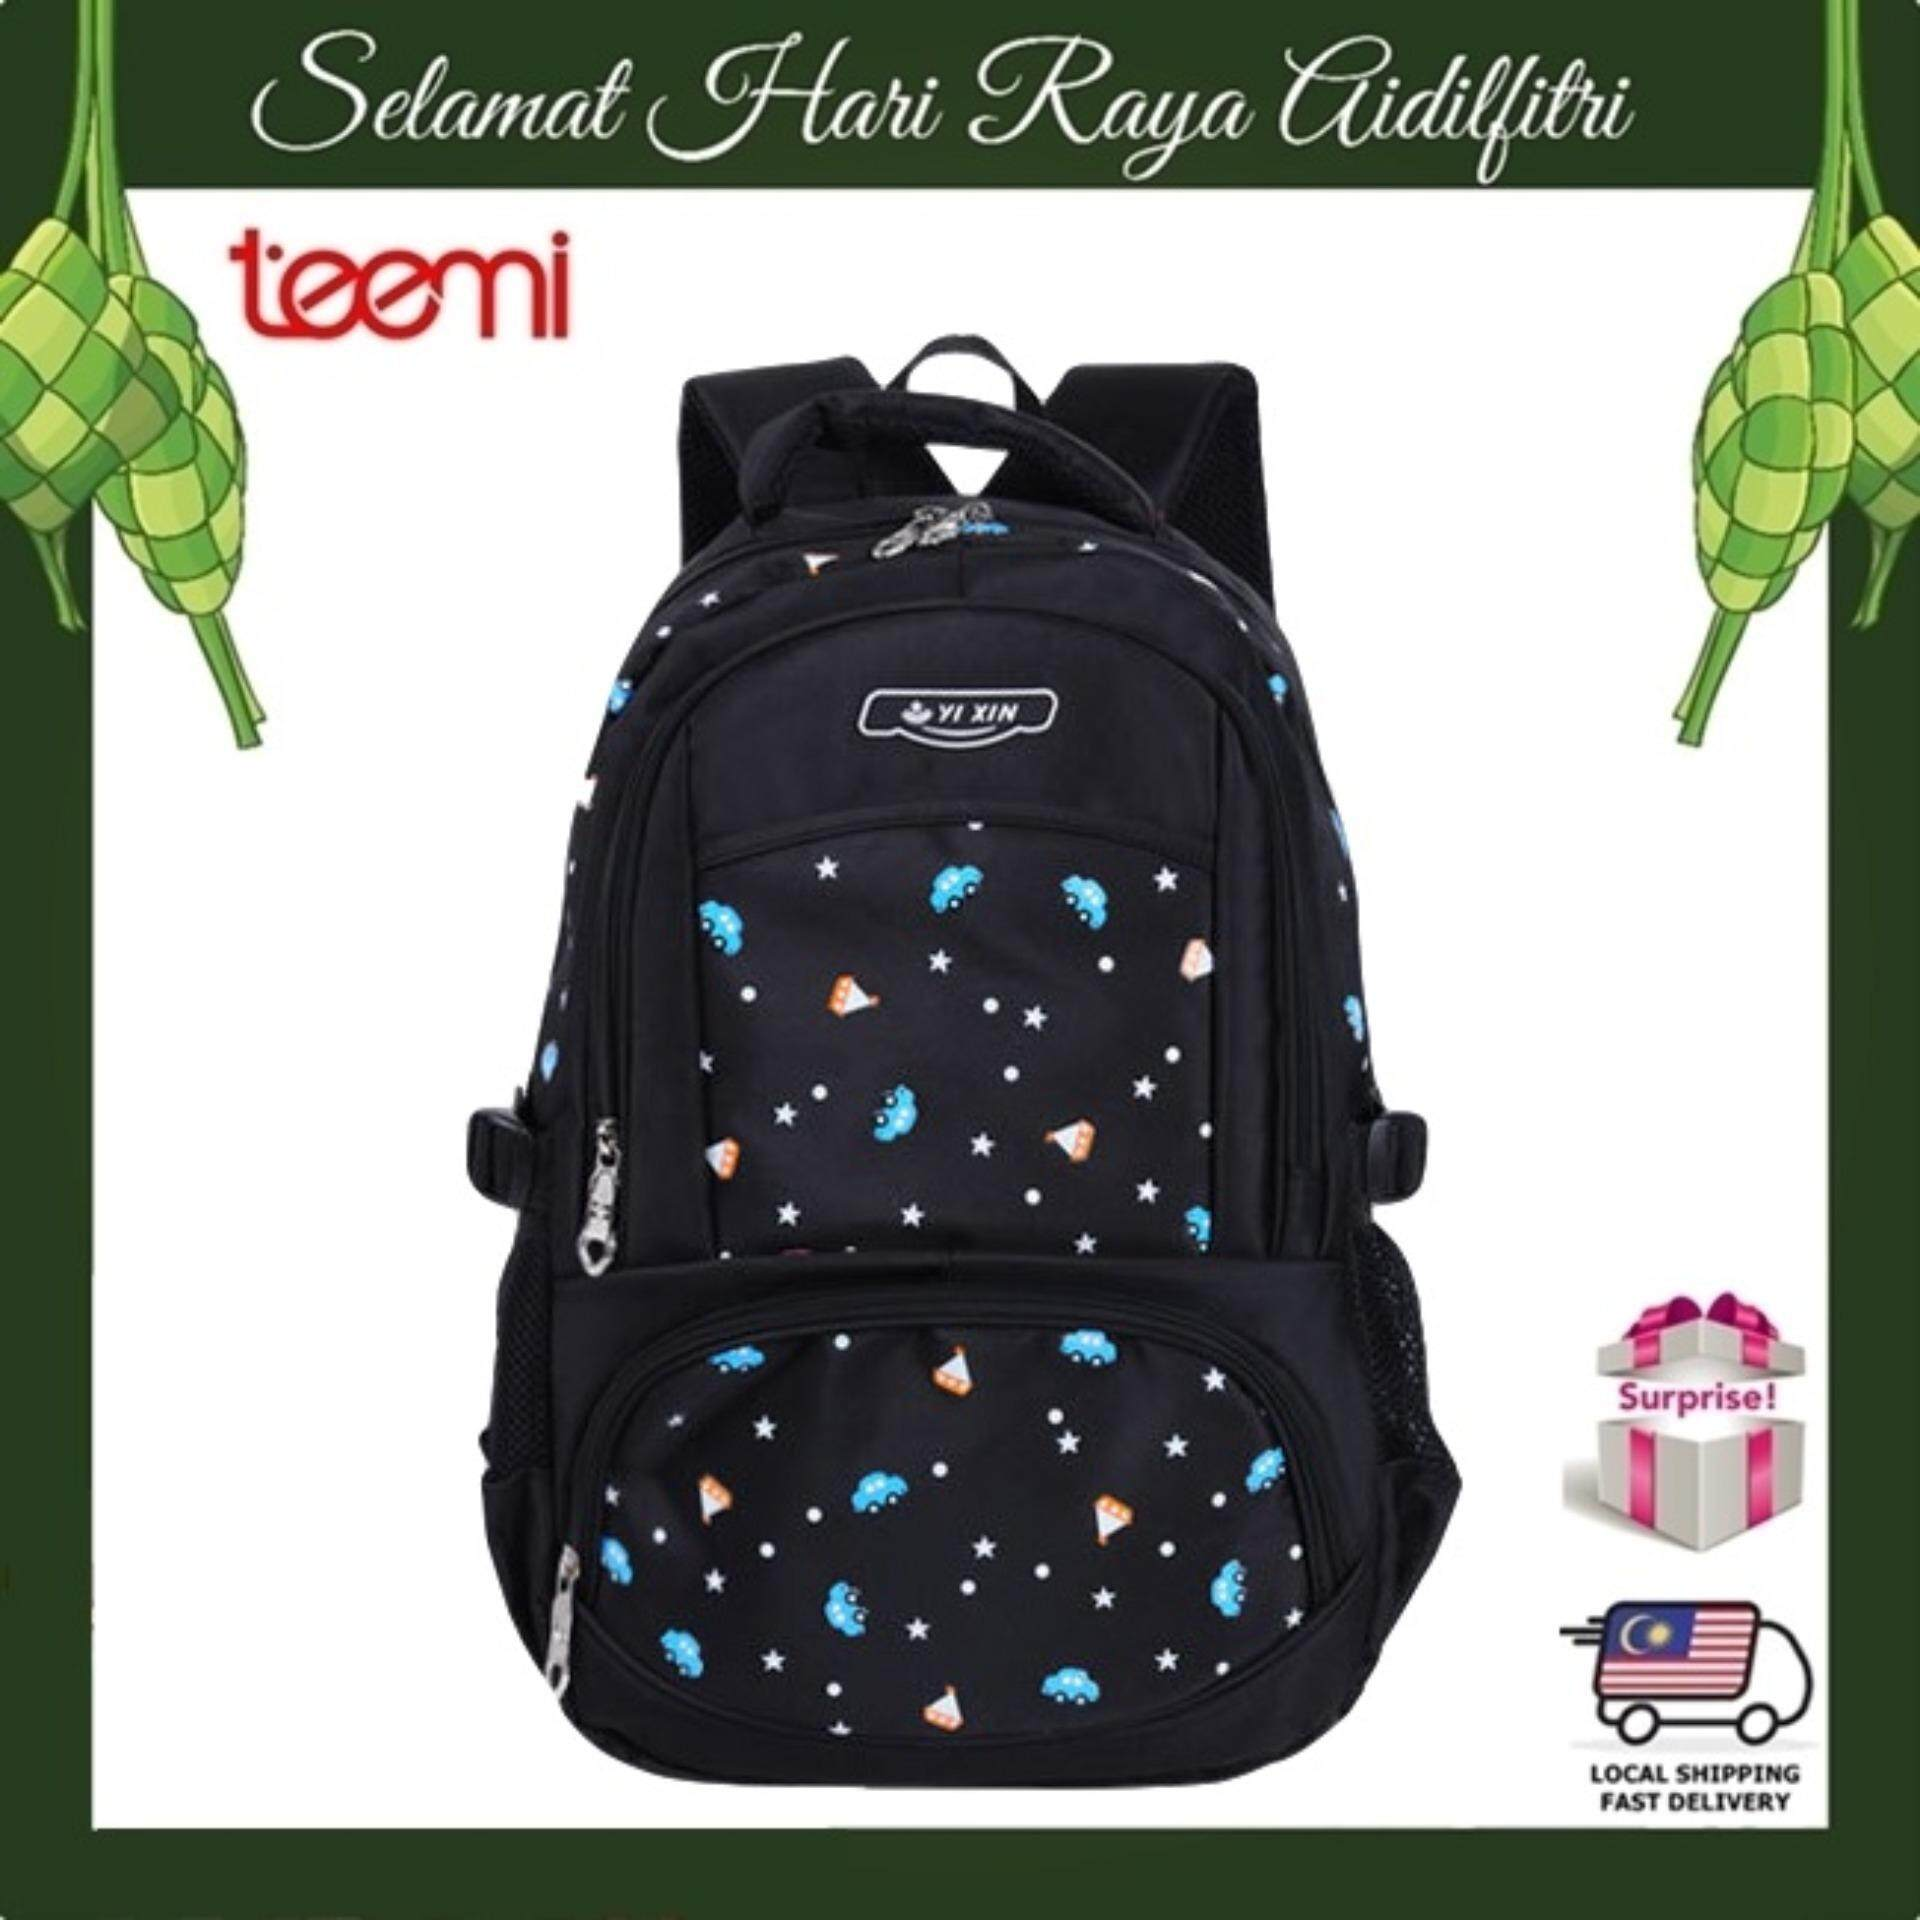 【TEEMI】 Girls Candy Color Primary Secondary Water Resistant Girlish Ergonomic Orthopedic School Bag Kids Children Laptop Backpack